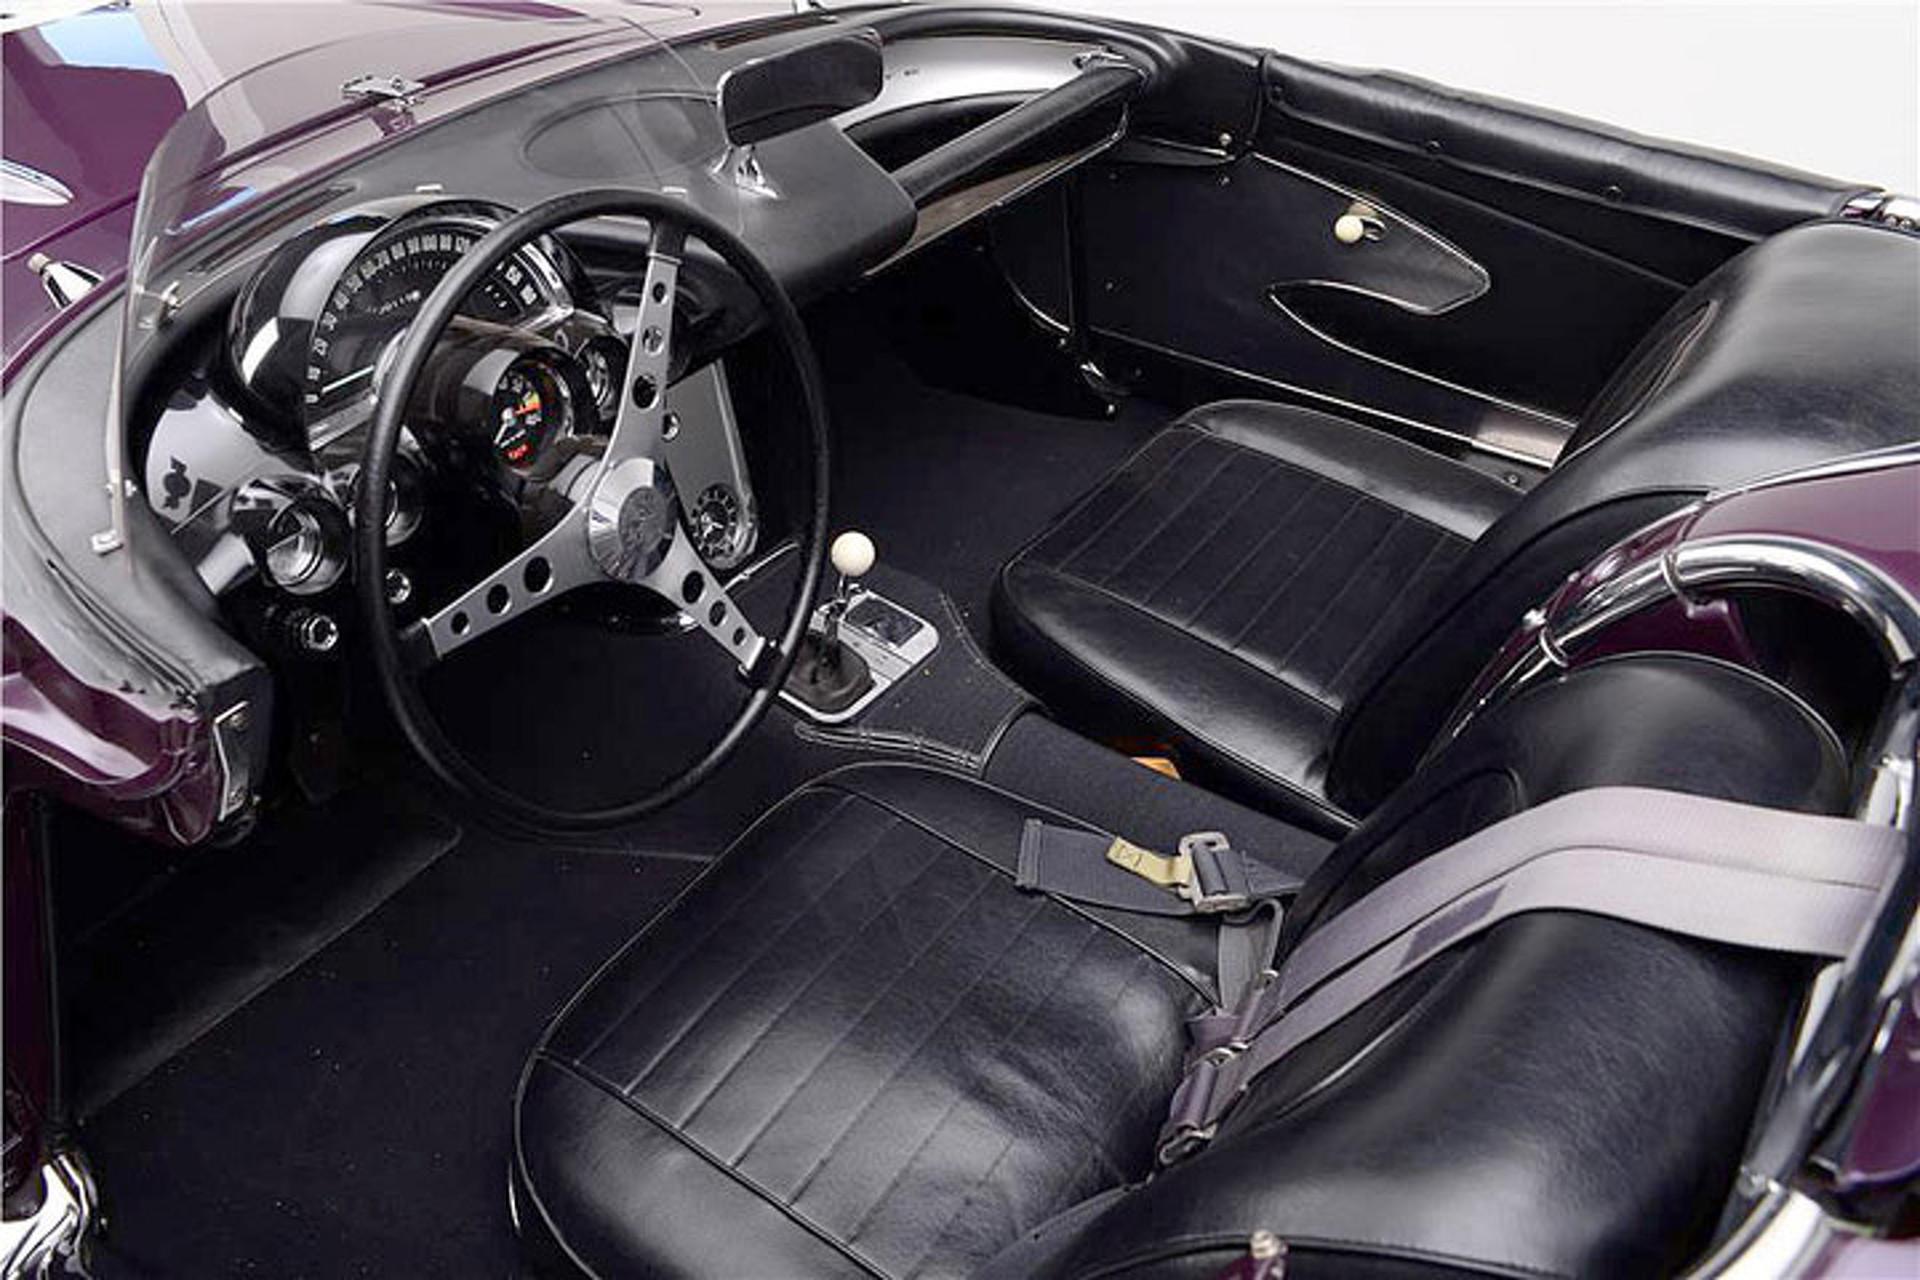 Purple People Eater: This Rare Corvette Has a Winning History